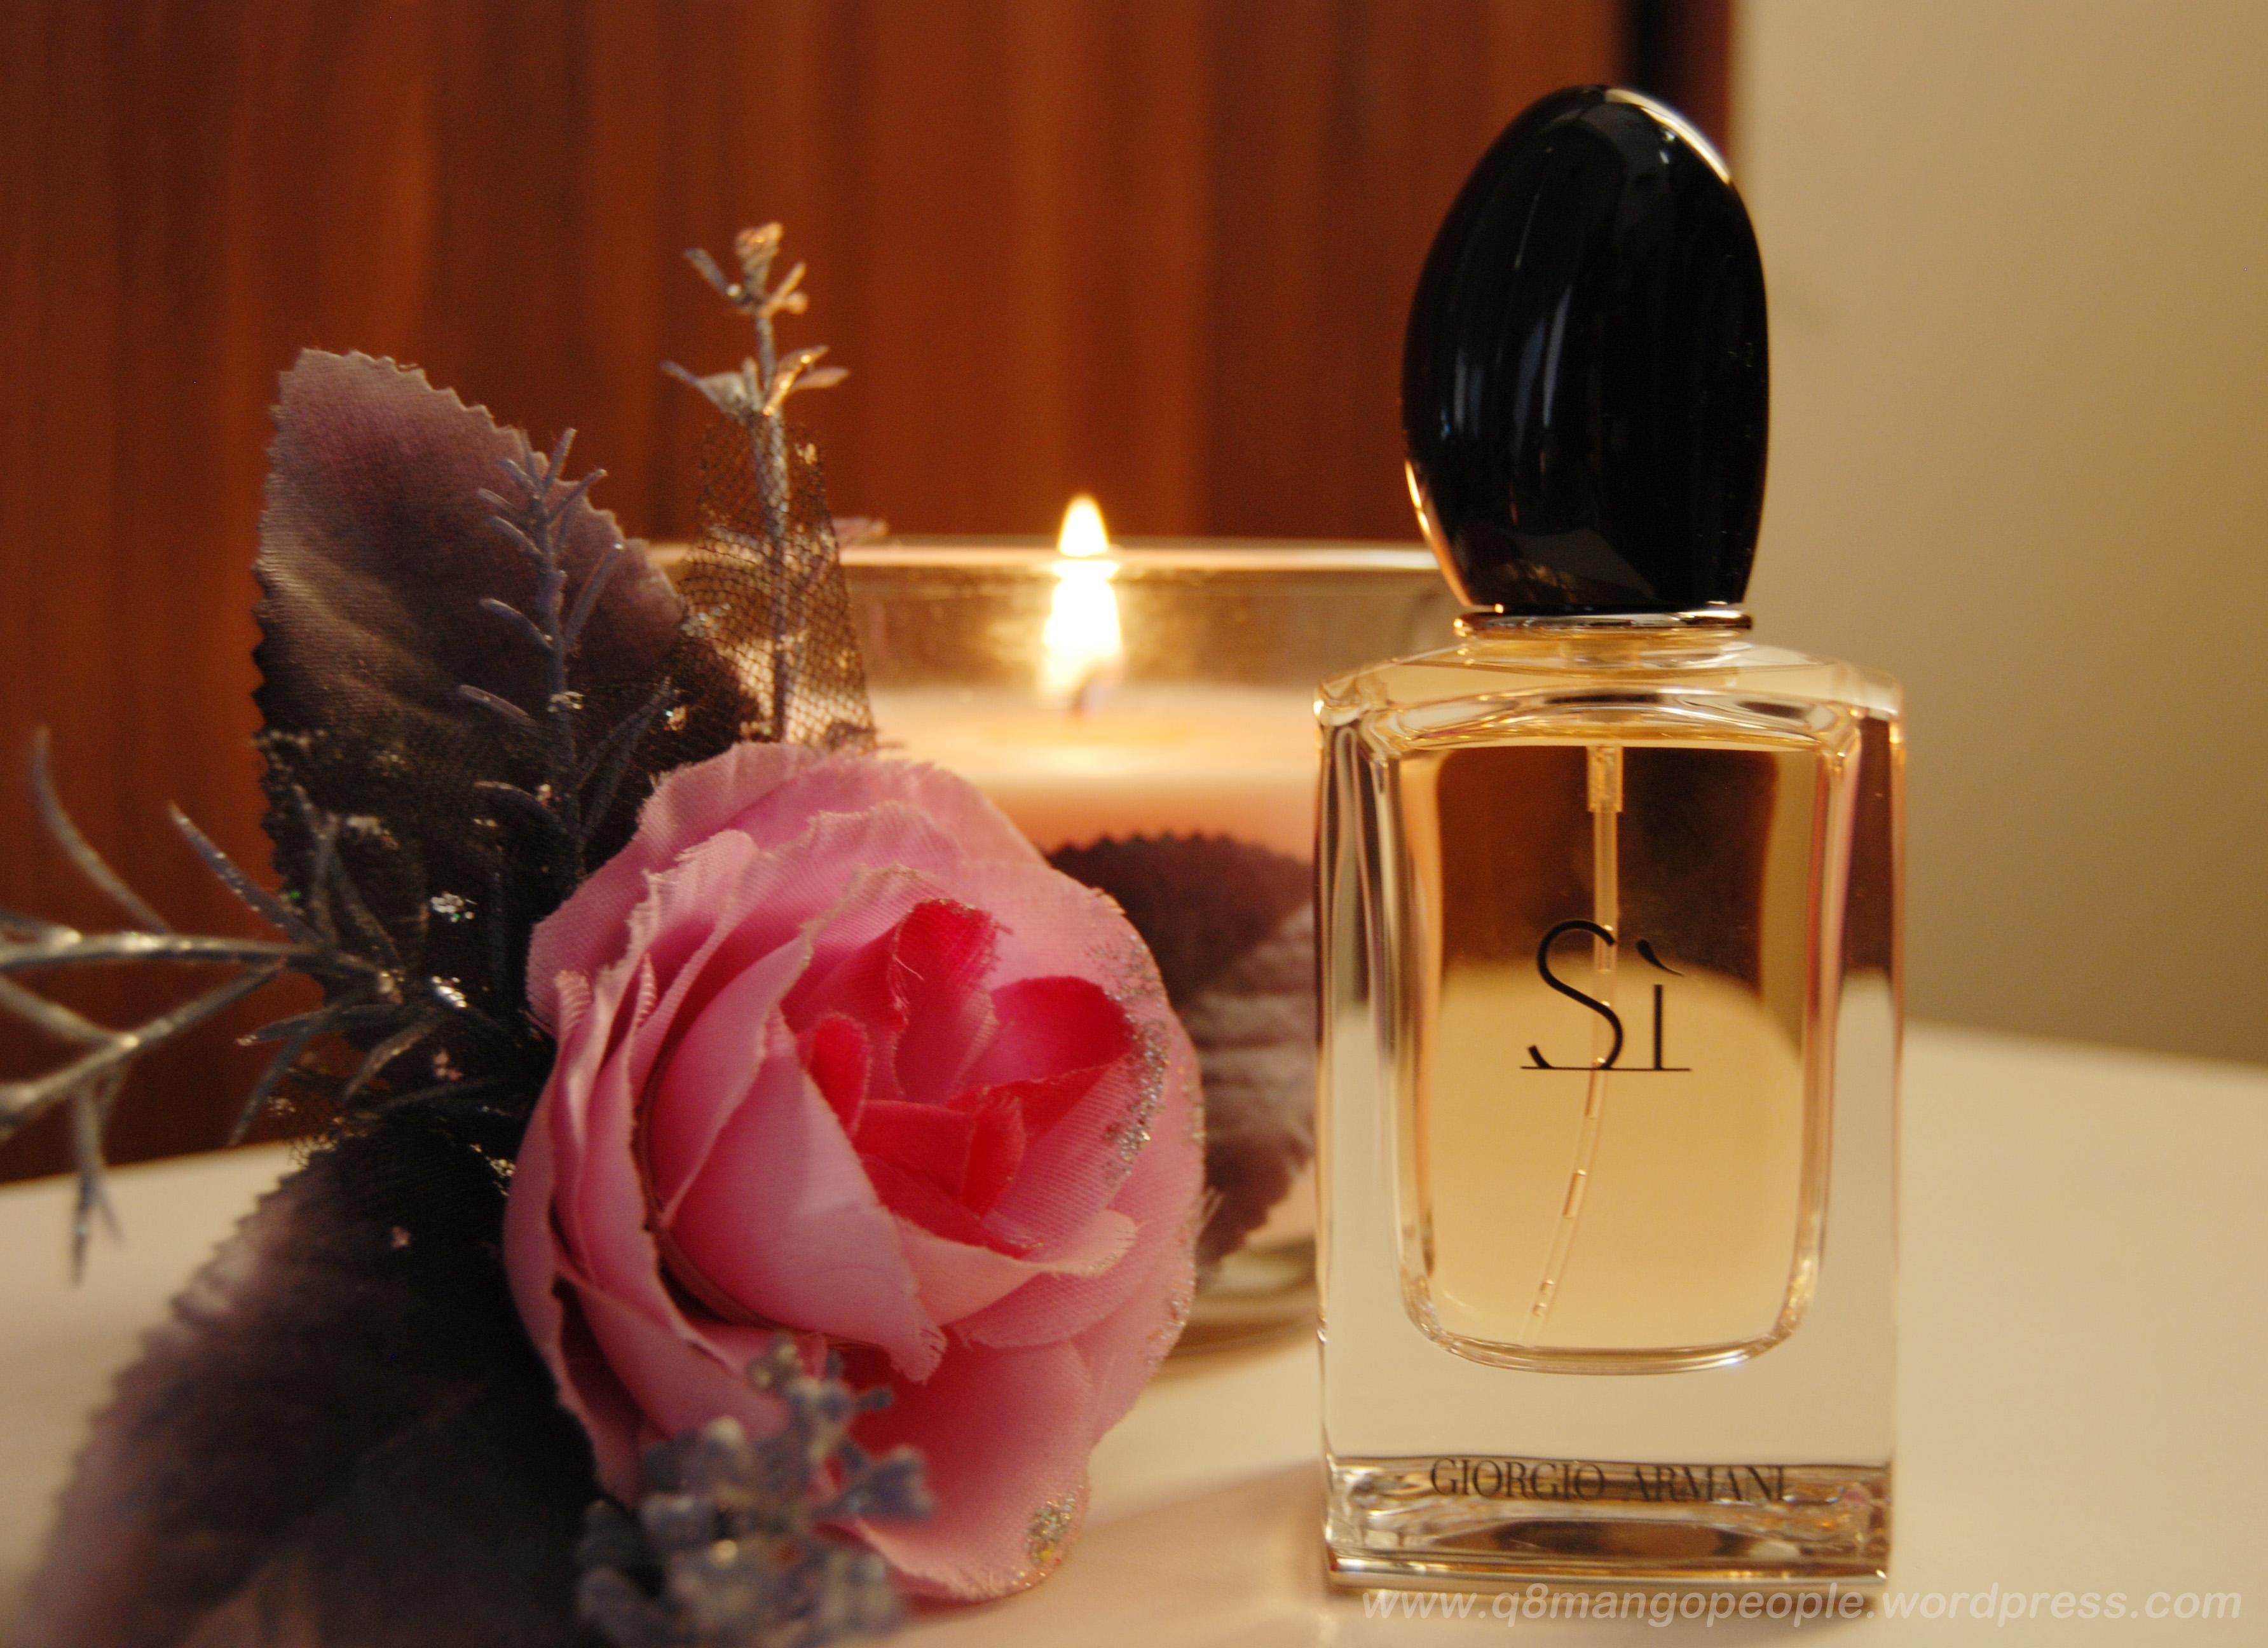 Perfume Review Si Giorgio Armani Q8 Mango People